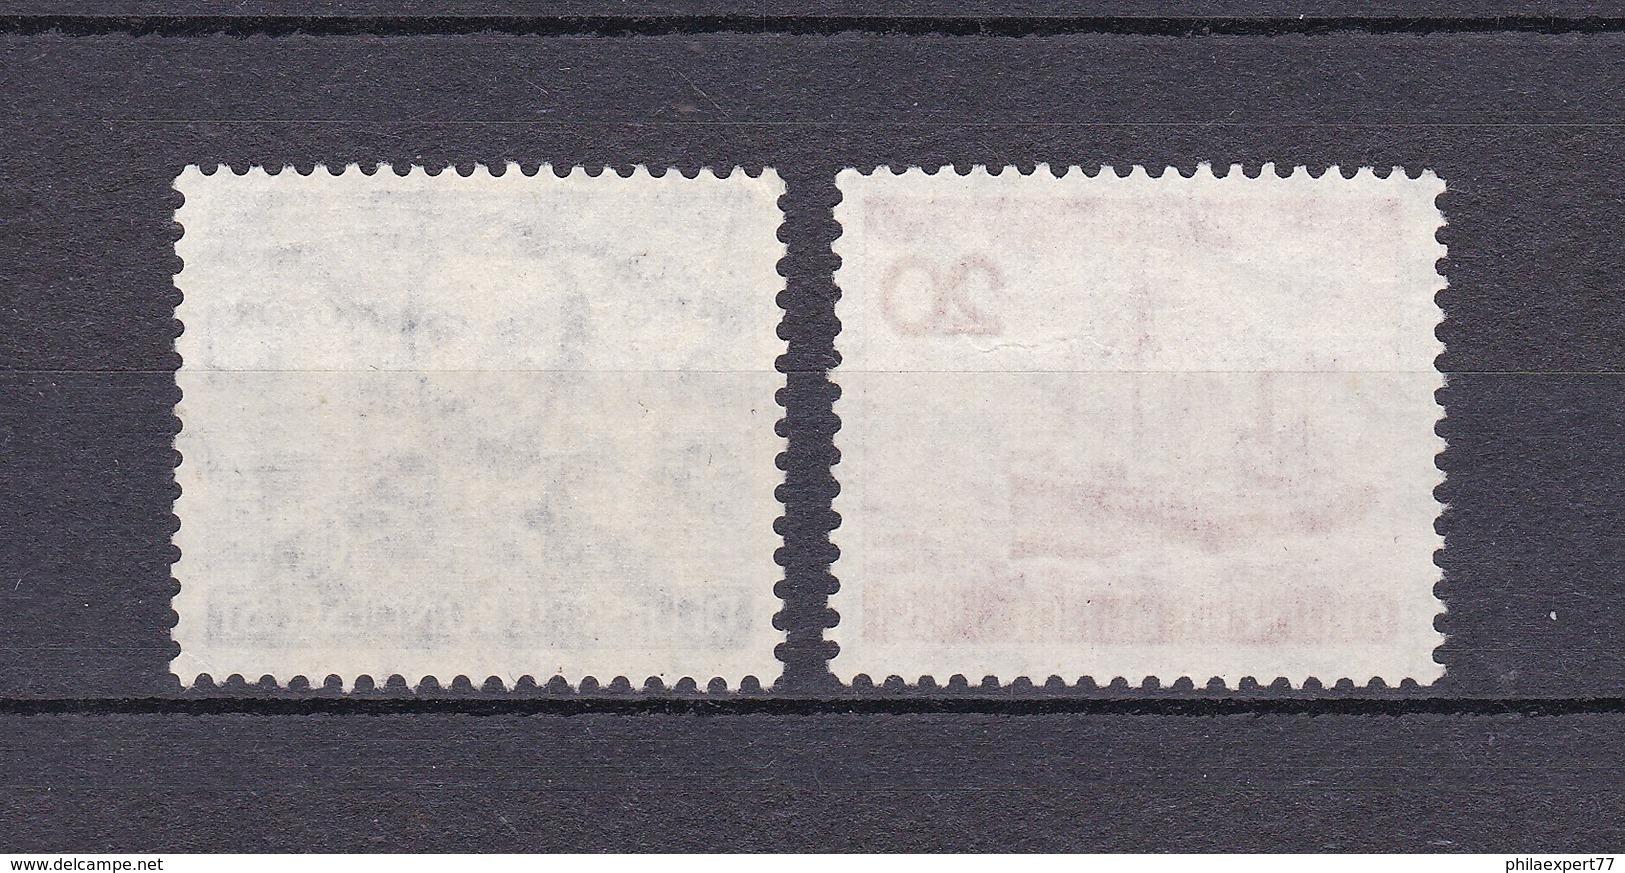 BRD - 1952 - Michel Nr. 150+152 - Gest. - 23 Euro - Gebraucht